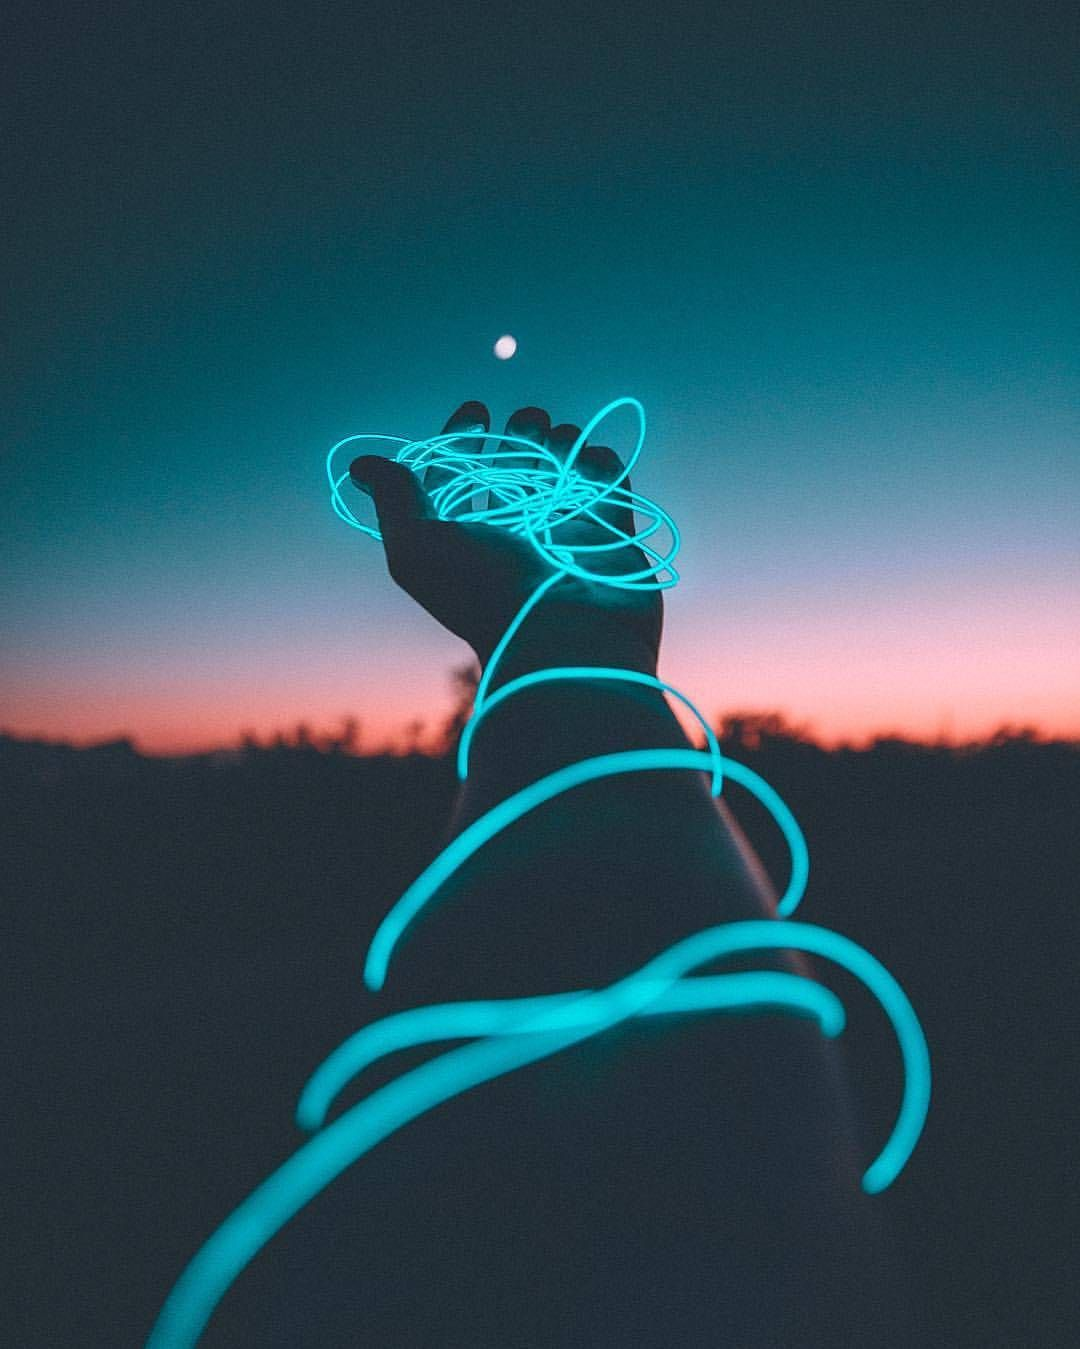 Pinterest Emma Weekly Instagram Photography Inspiration Neon Sunset Art Photography Art Neon